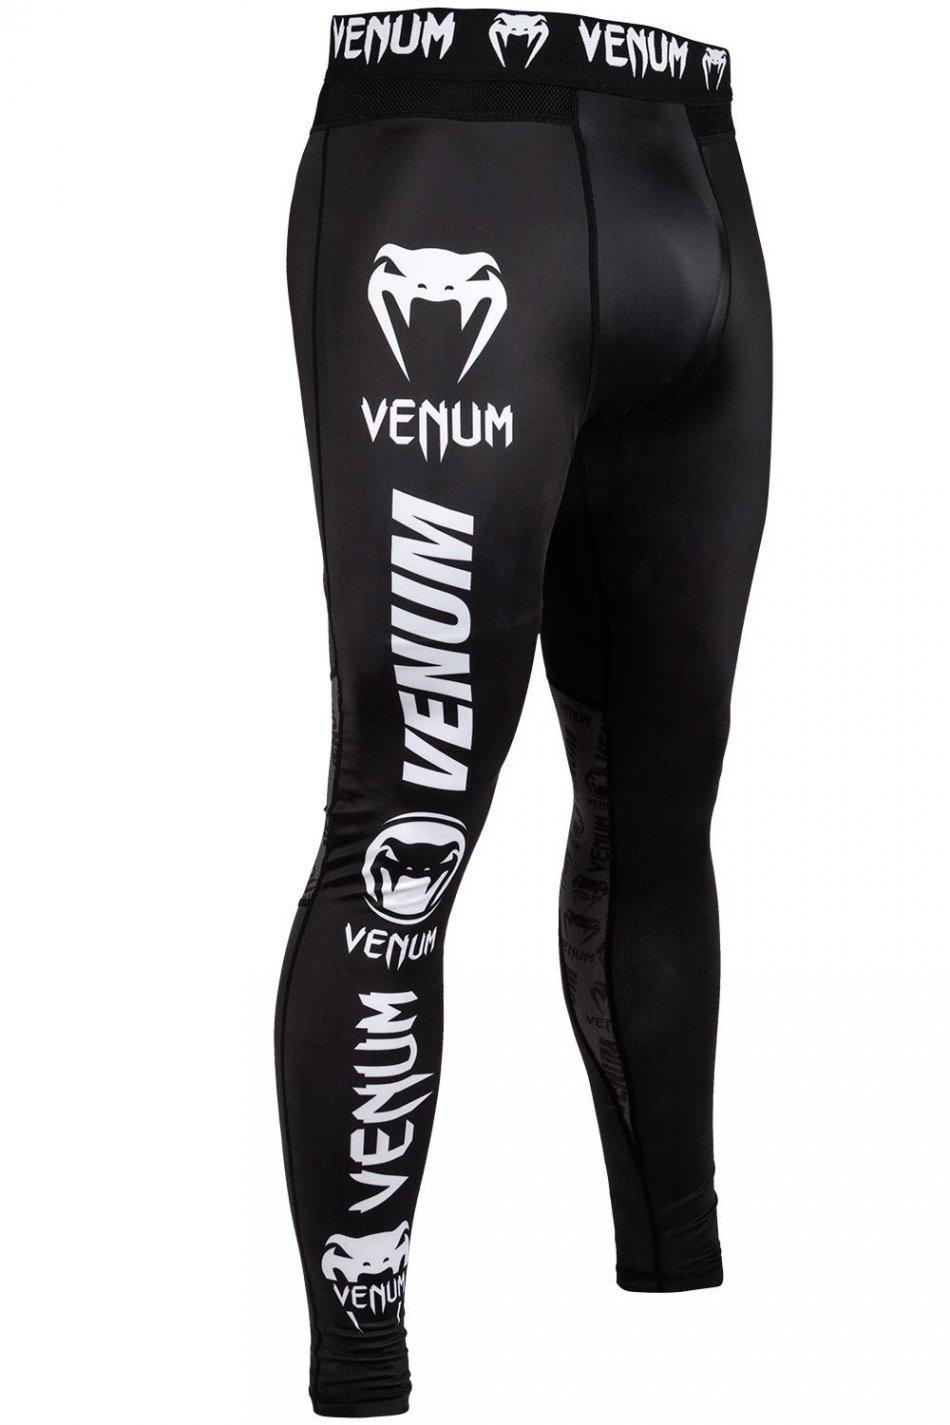 Pantaloni, Venum, 03448-108, Negru/Alb, 2XL